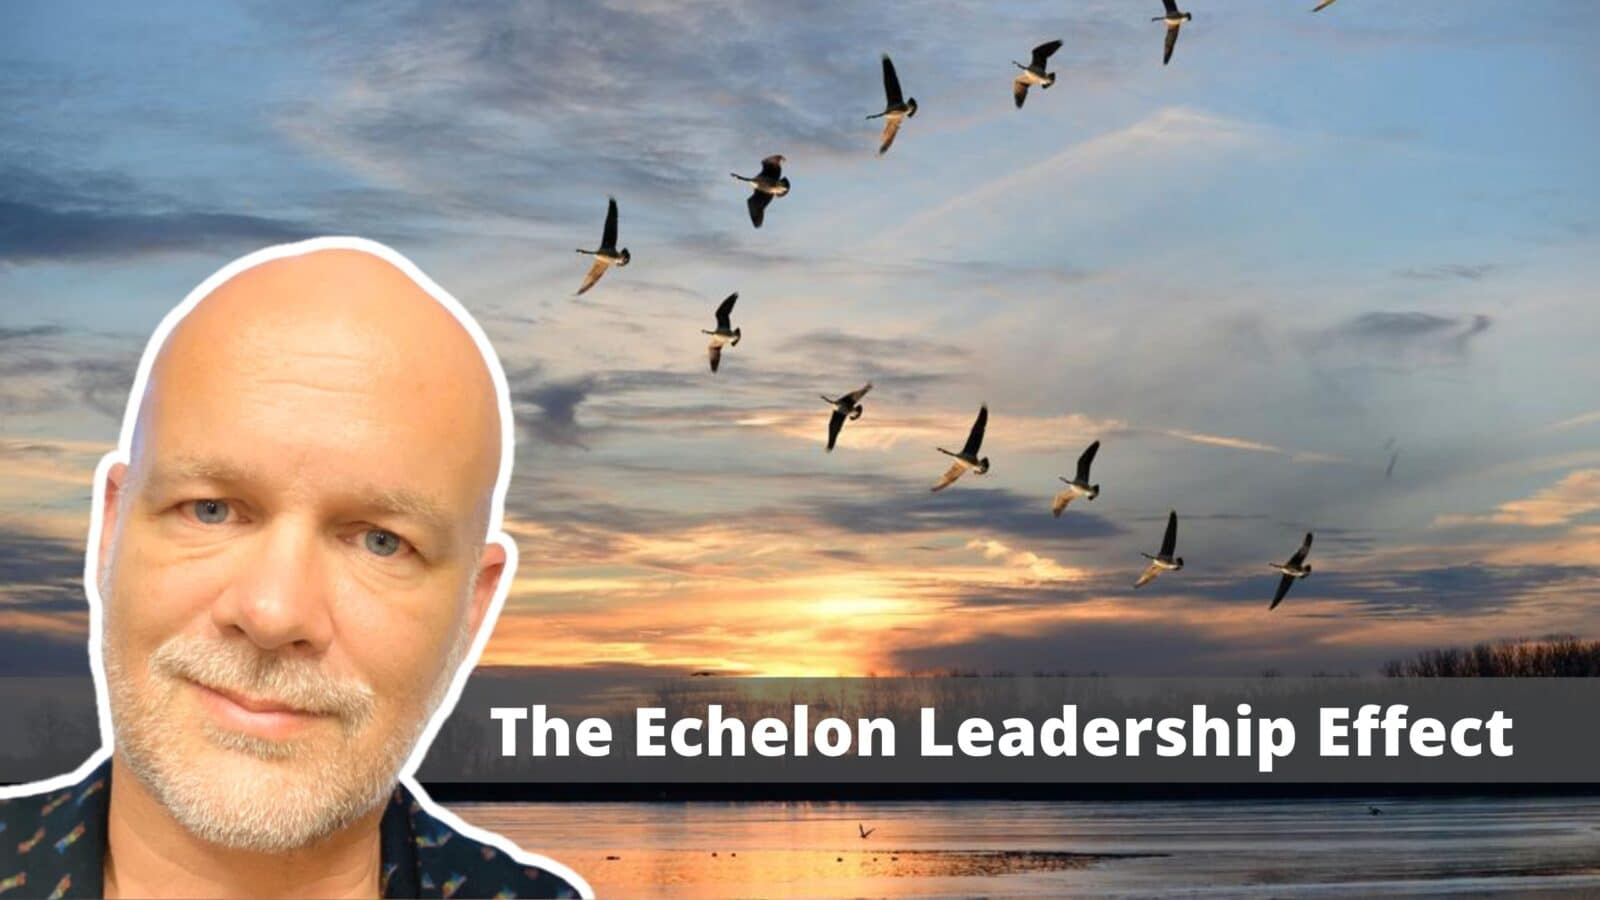 Curtis Danskin The Echelon Leadership Effect lgbtq entrepreneur gay professional business owner OutBuro communit member